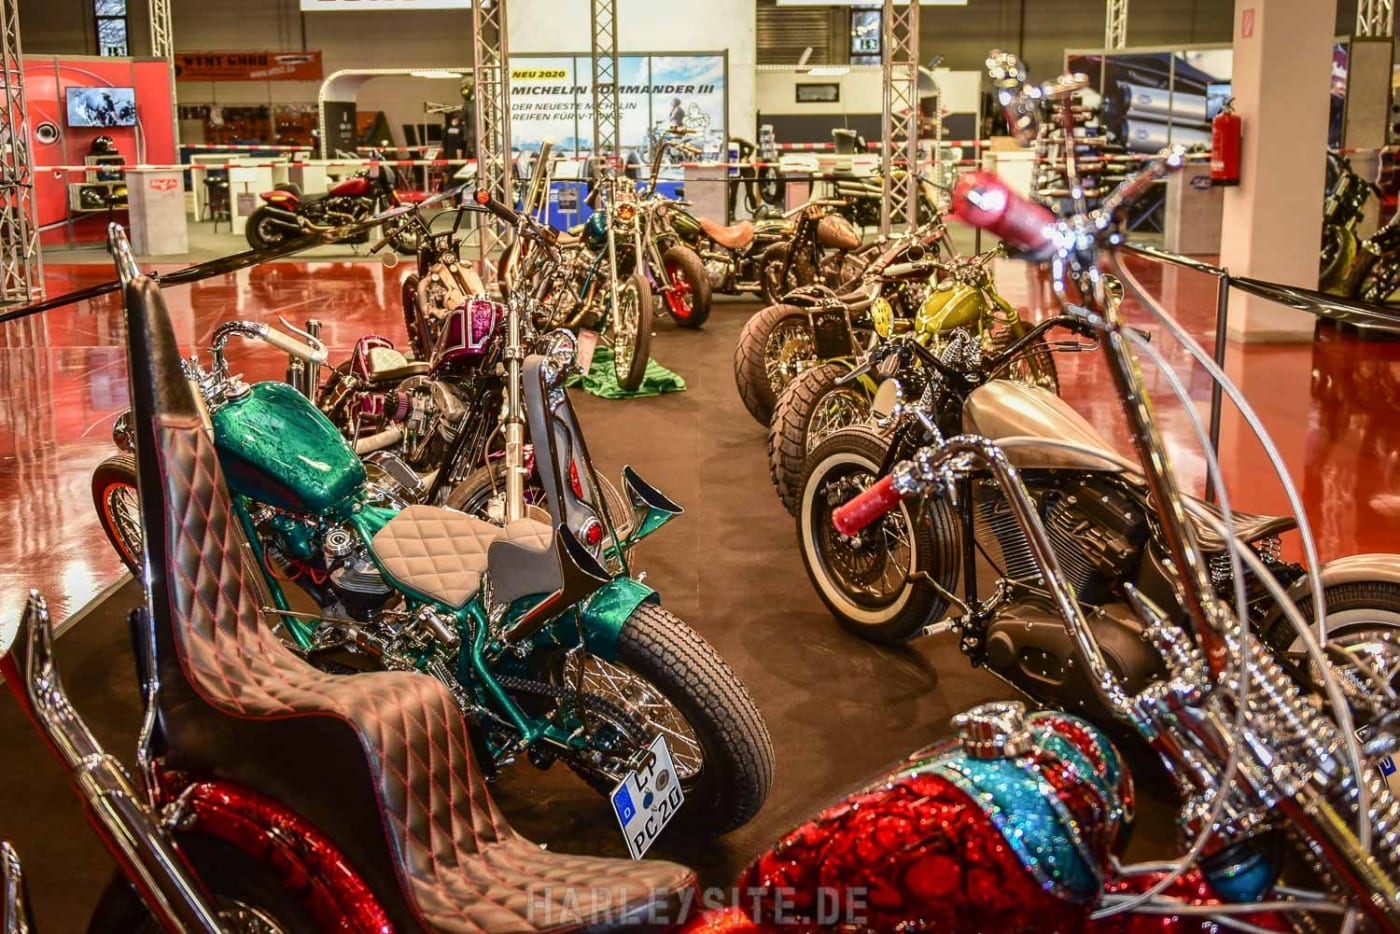 Custombike Show Bad Salzuflen 2019.